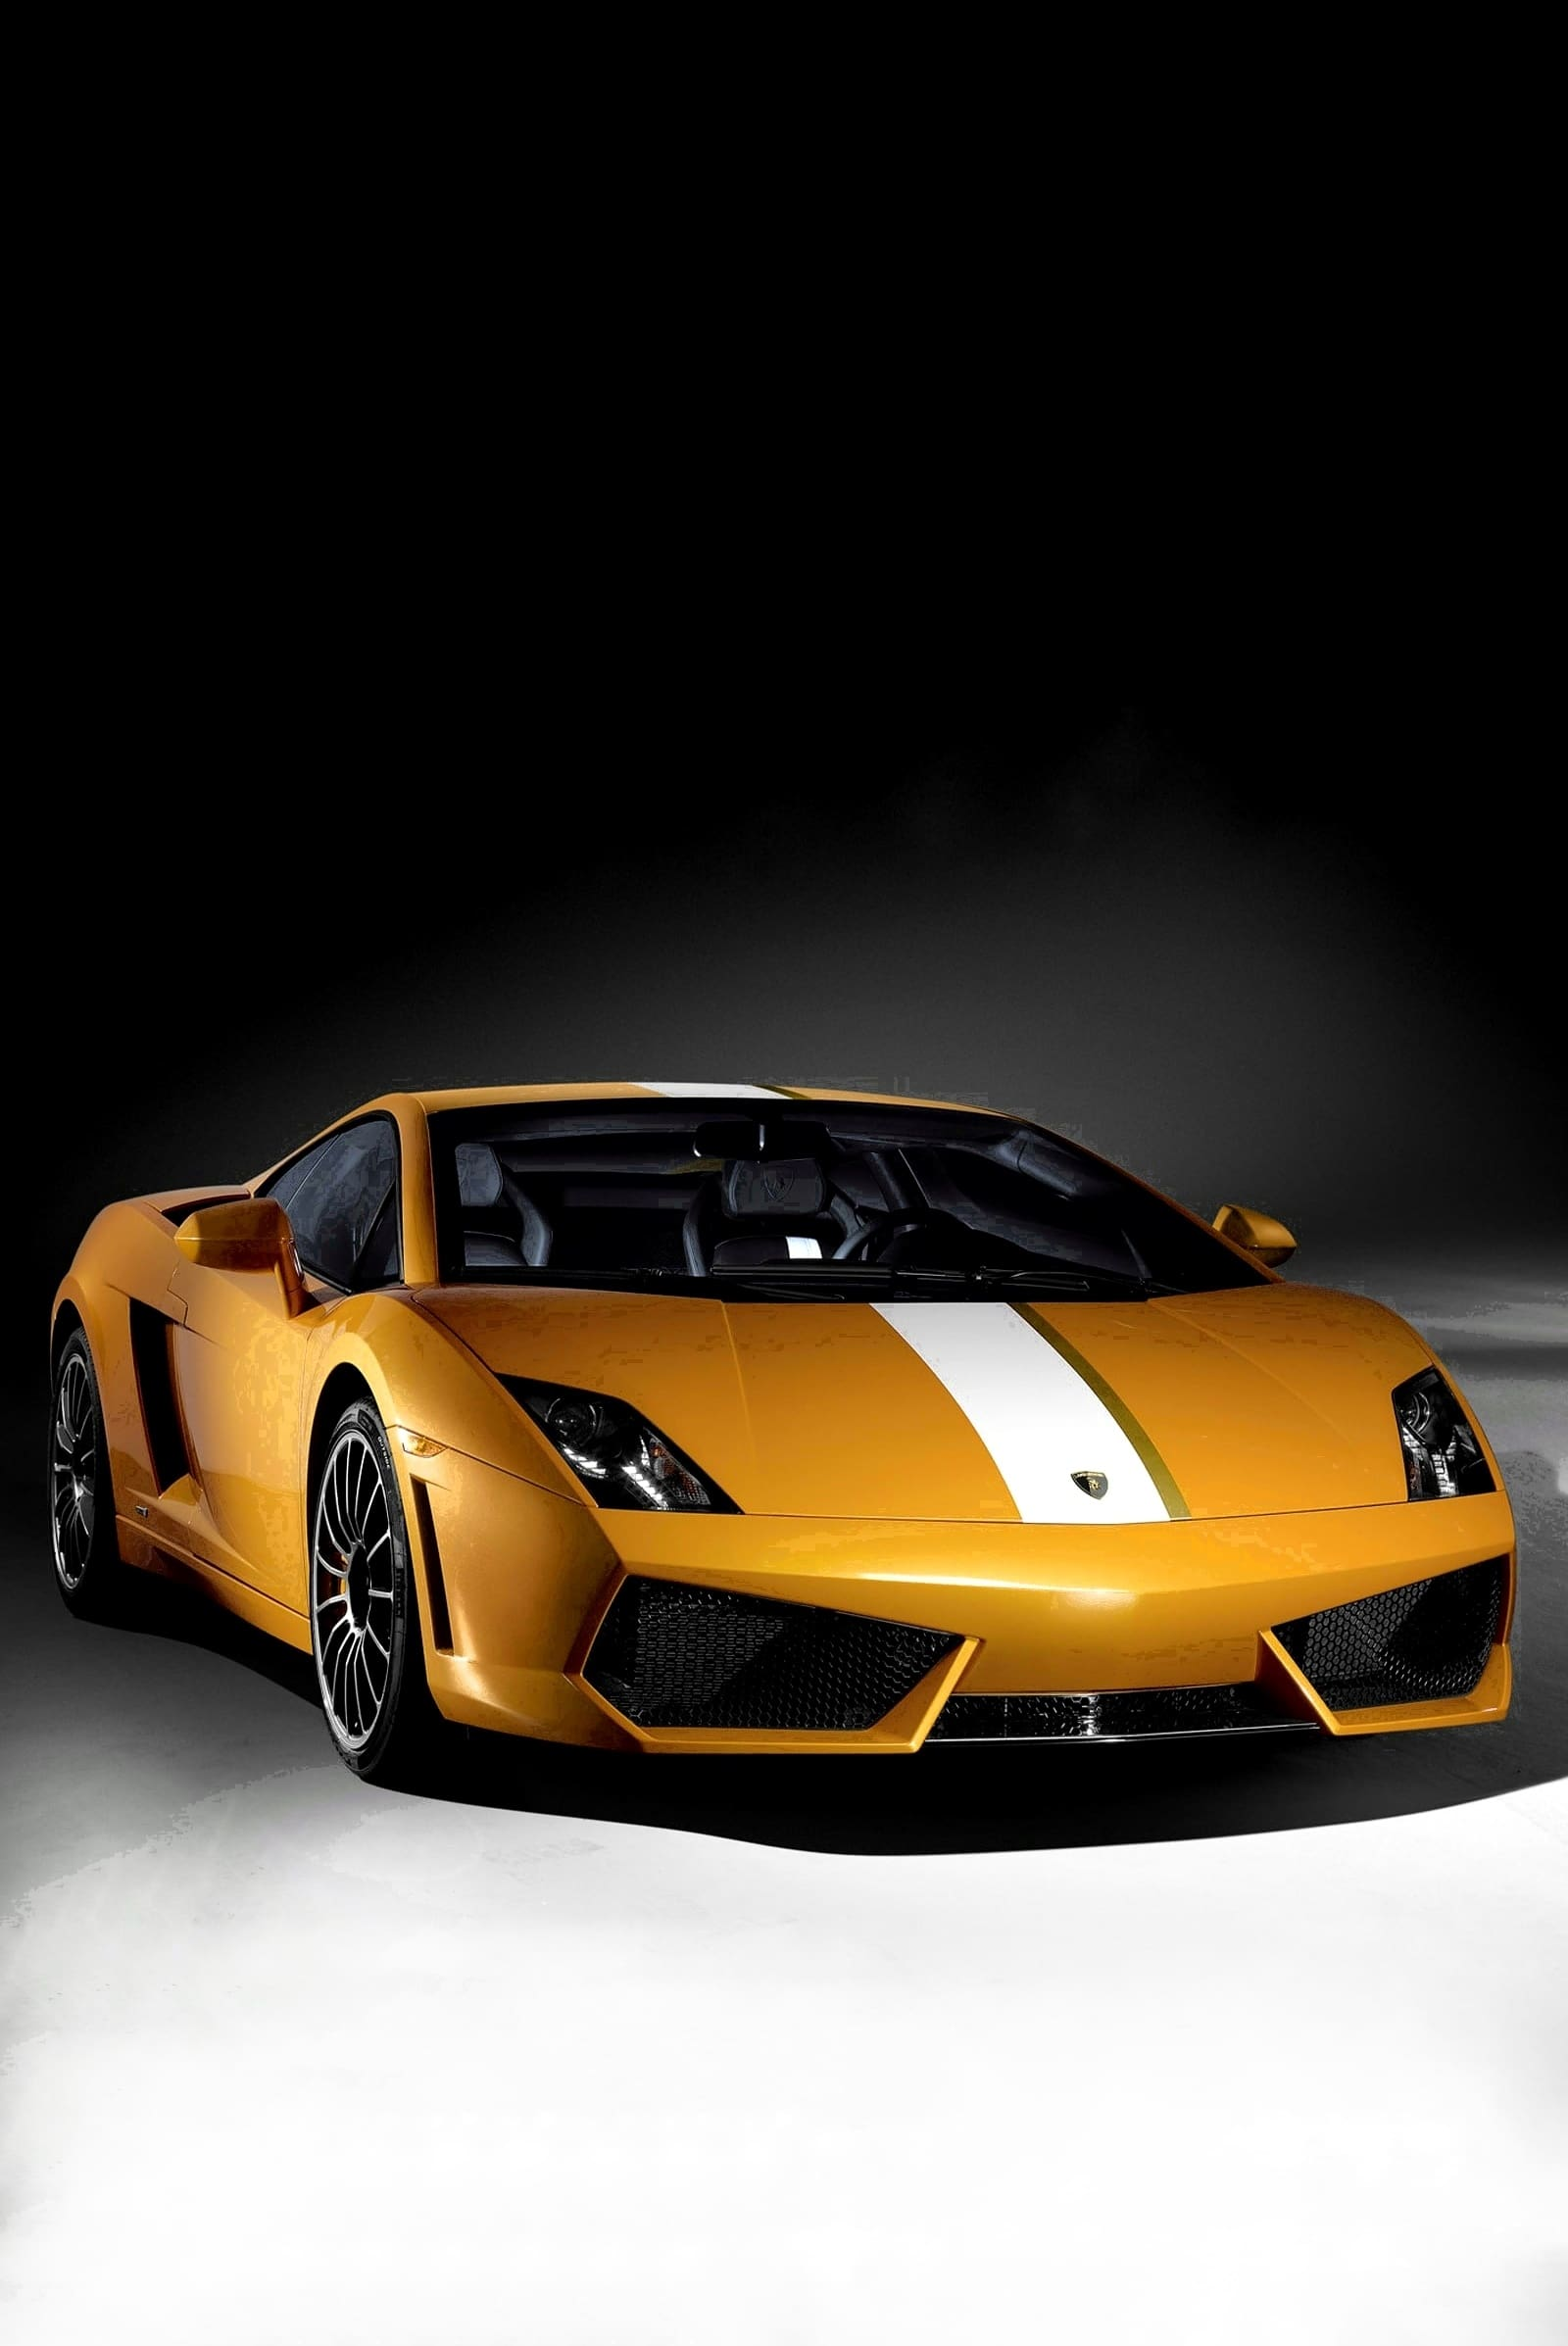 Lamborghini Gallardo LP 560 4